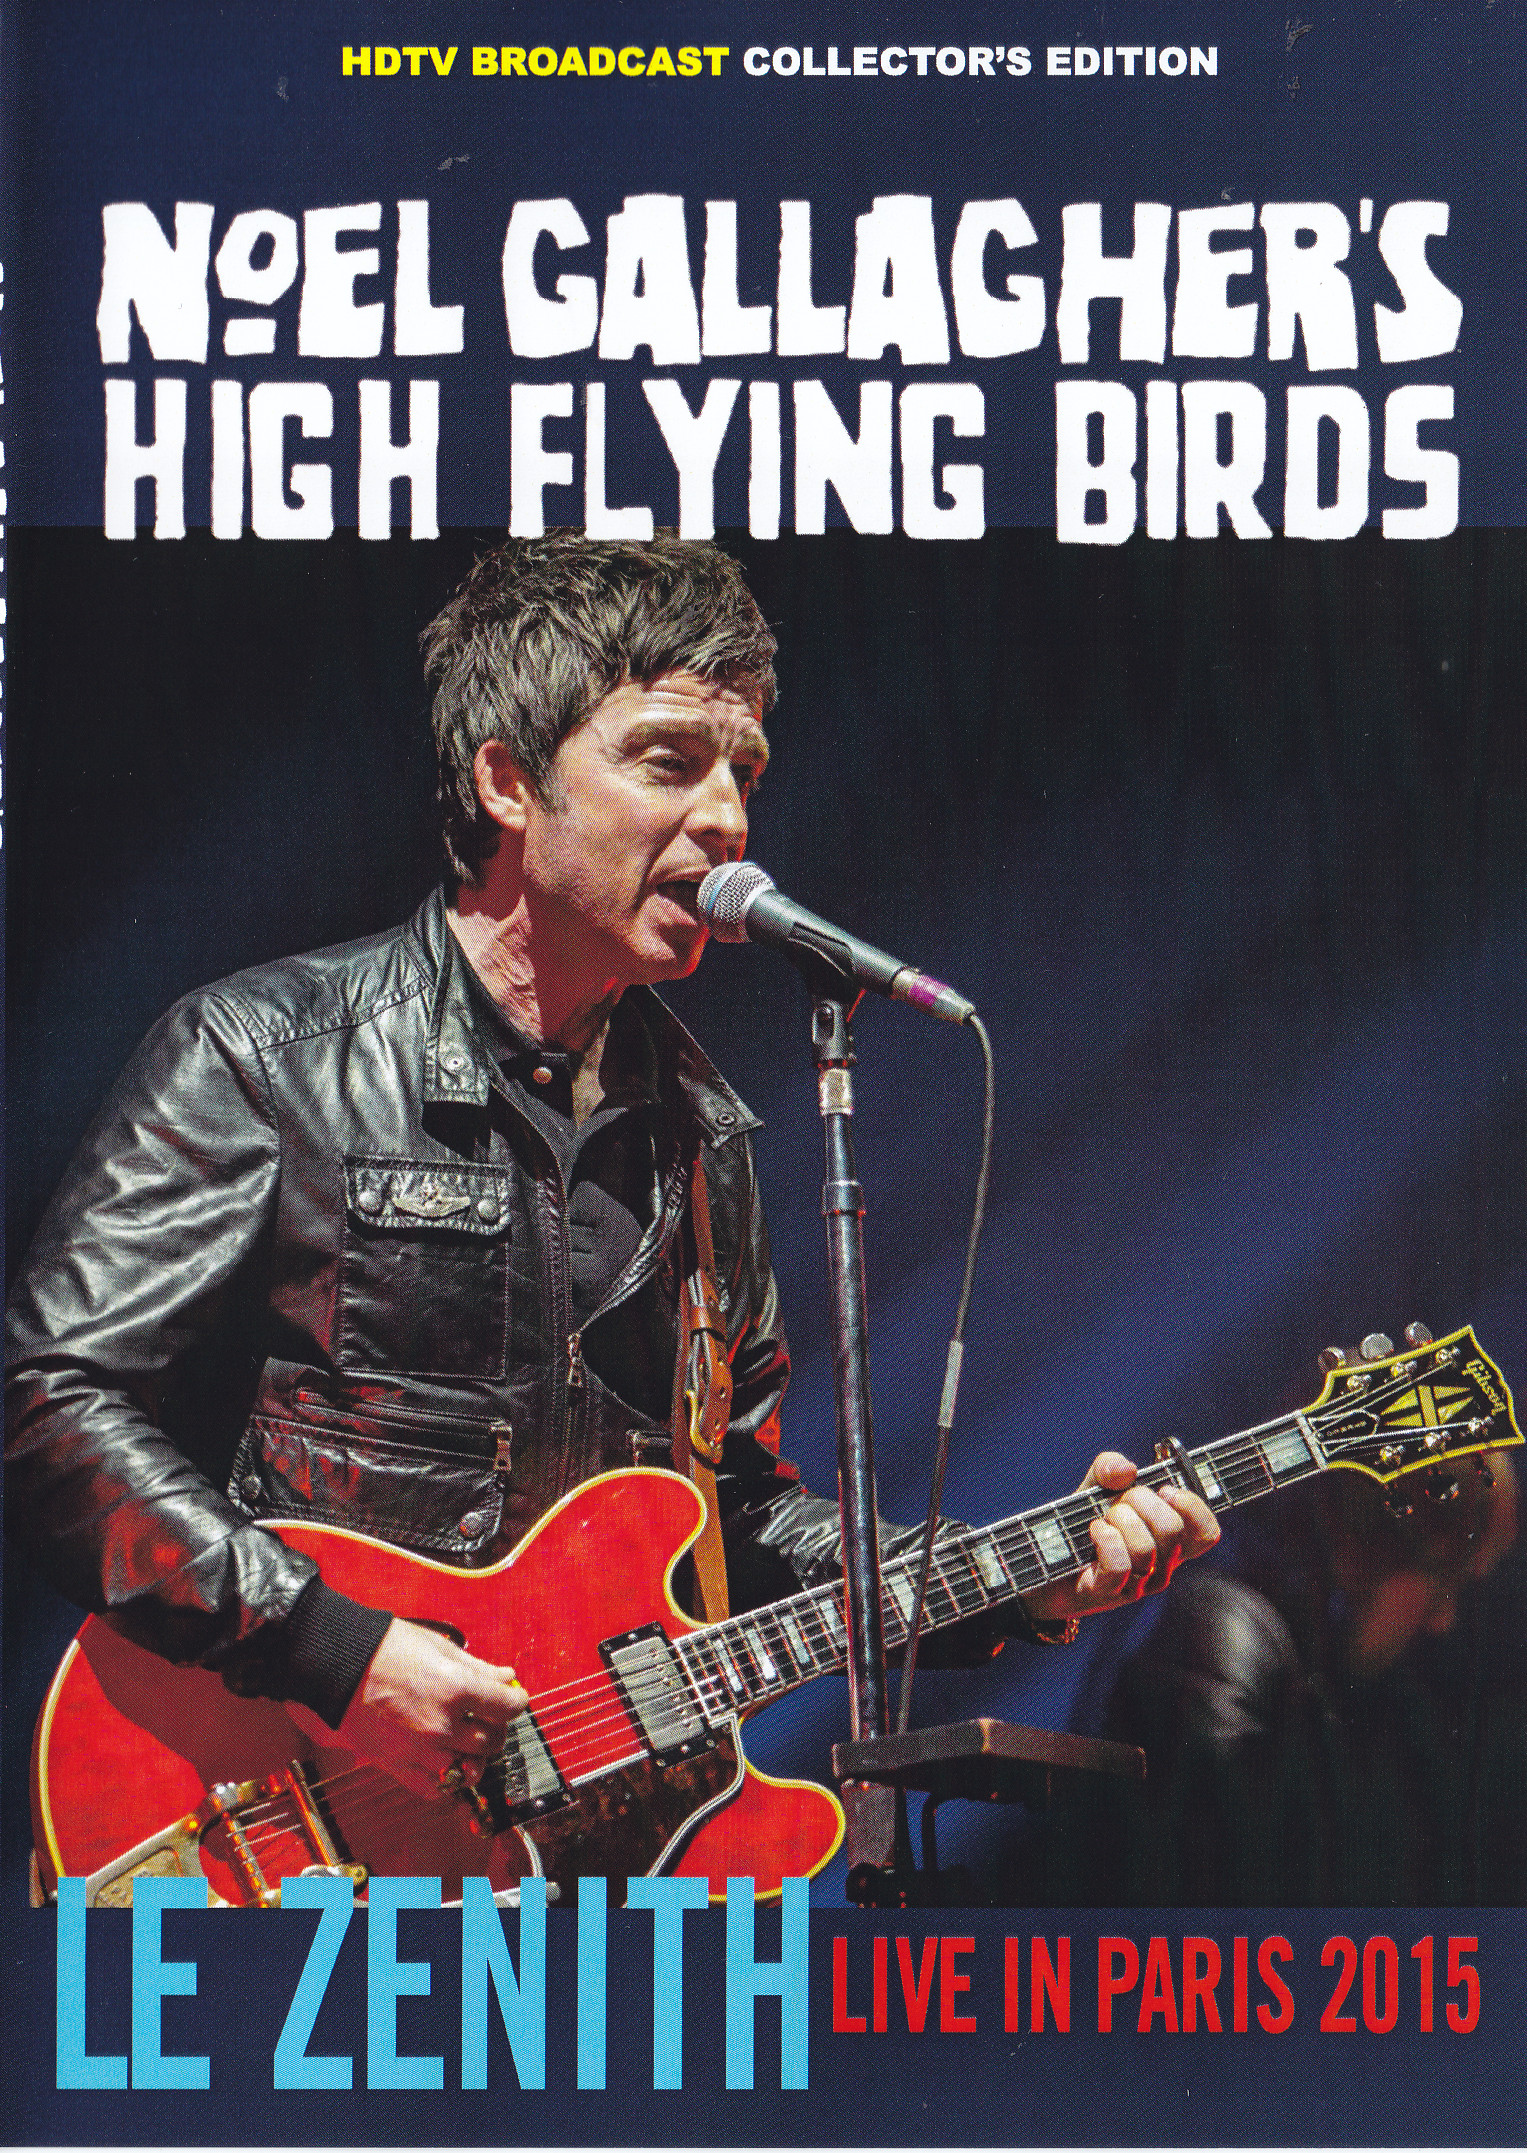 noel gallagher paris zenith 2018 Noel Gallaghers High Flying Birds / Le Zenith Live In Paris 2015  noel gallagher paris zenith 2018